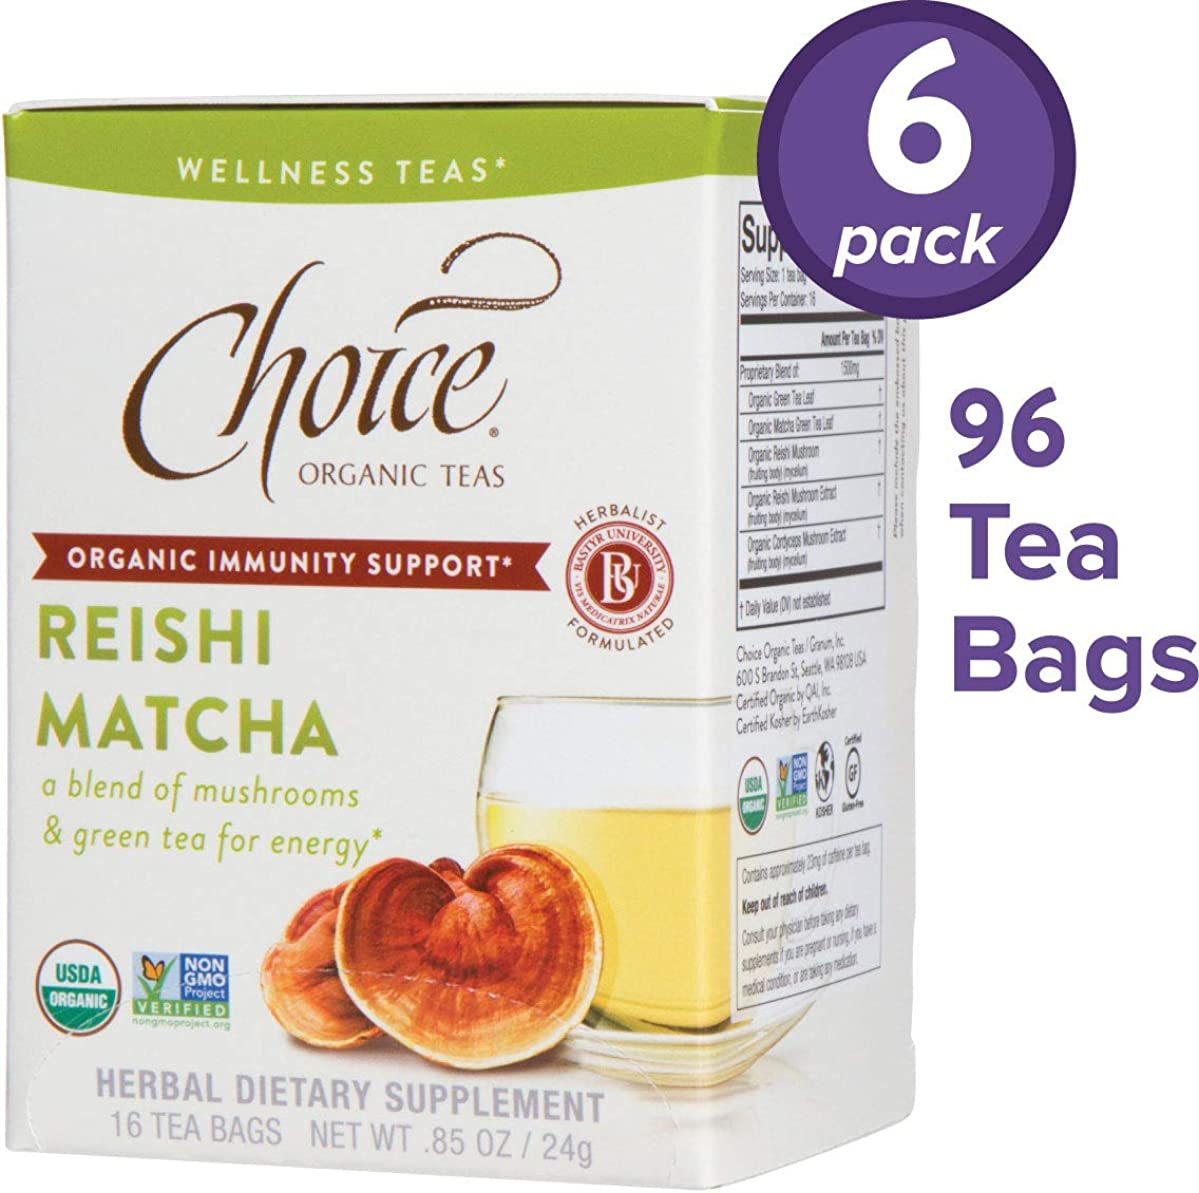 Choice Organic Teas Wellness Teas, 6 Boxes of 16 (96 Tea Bags), Reishi Matcha